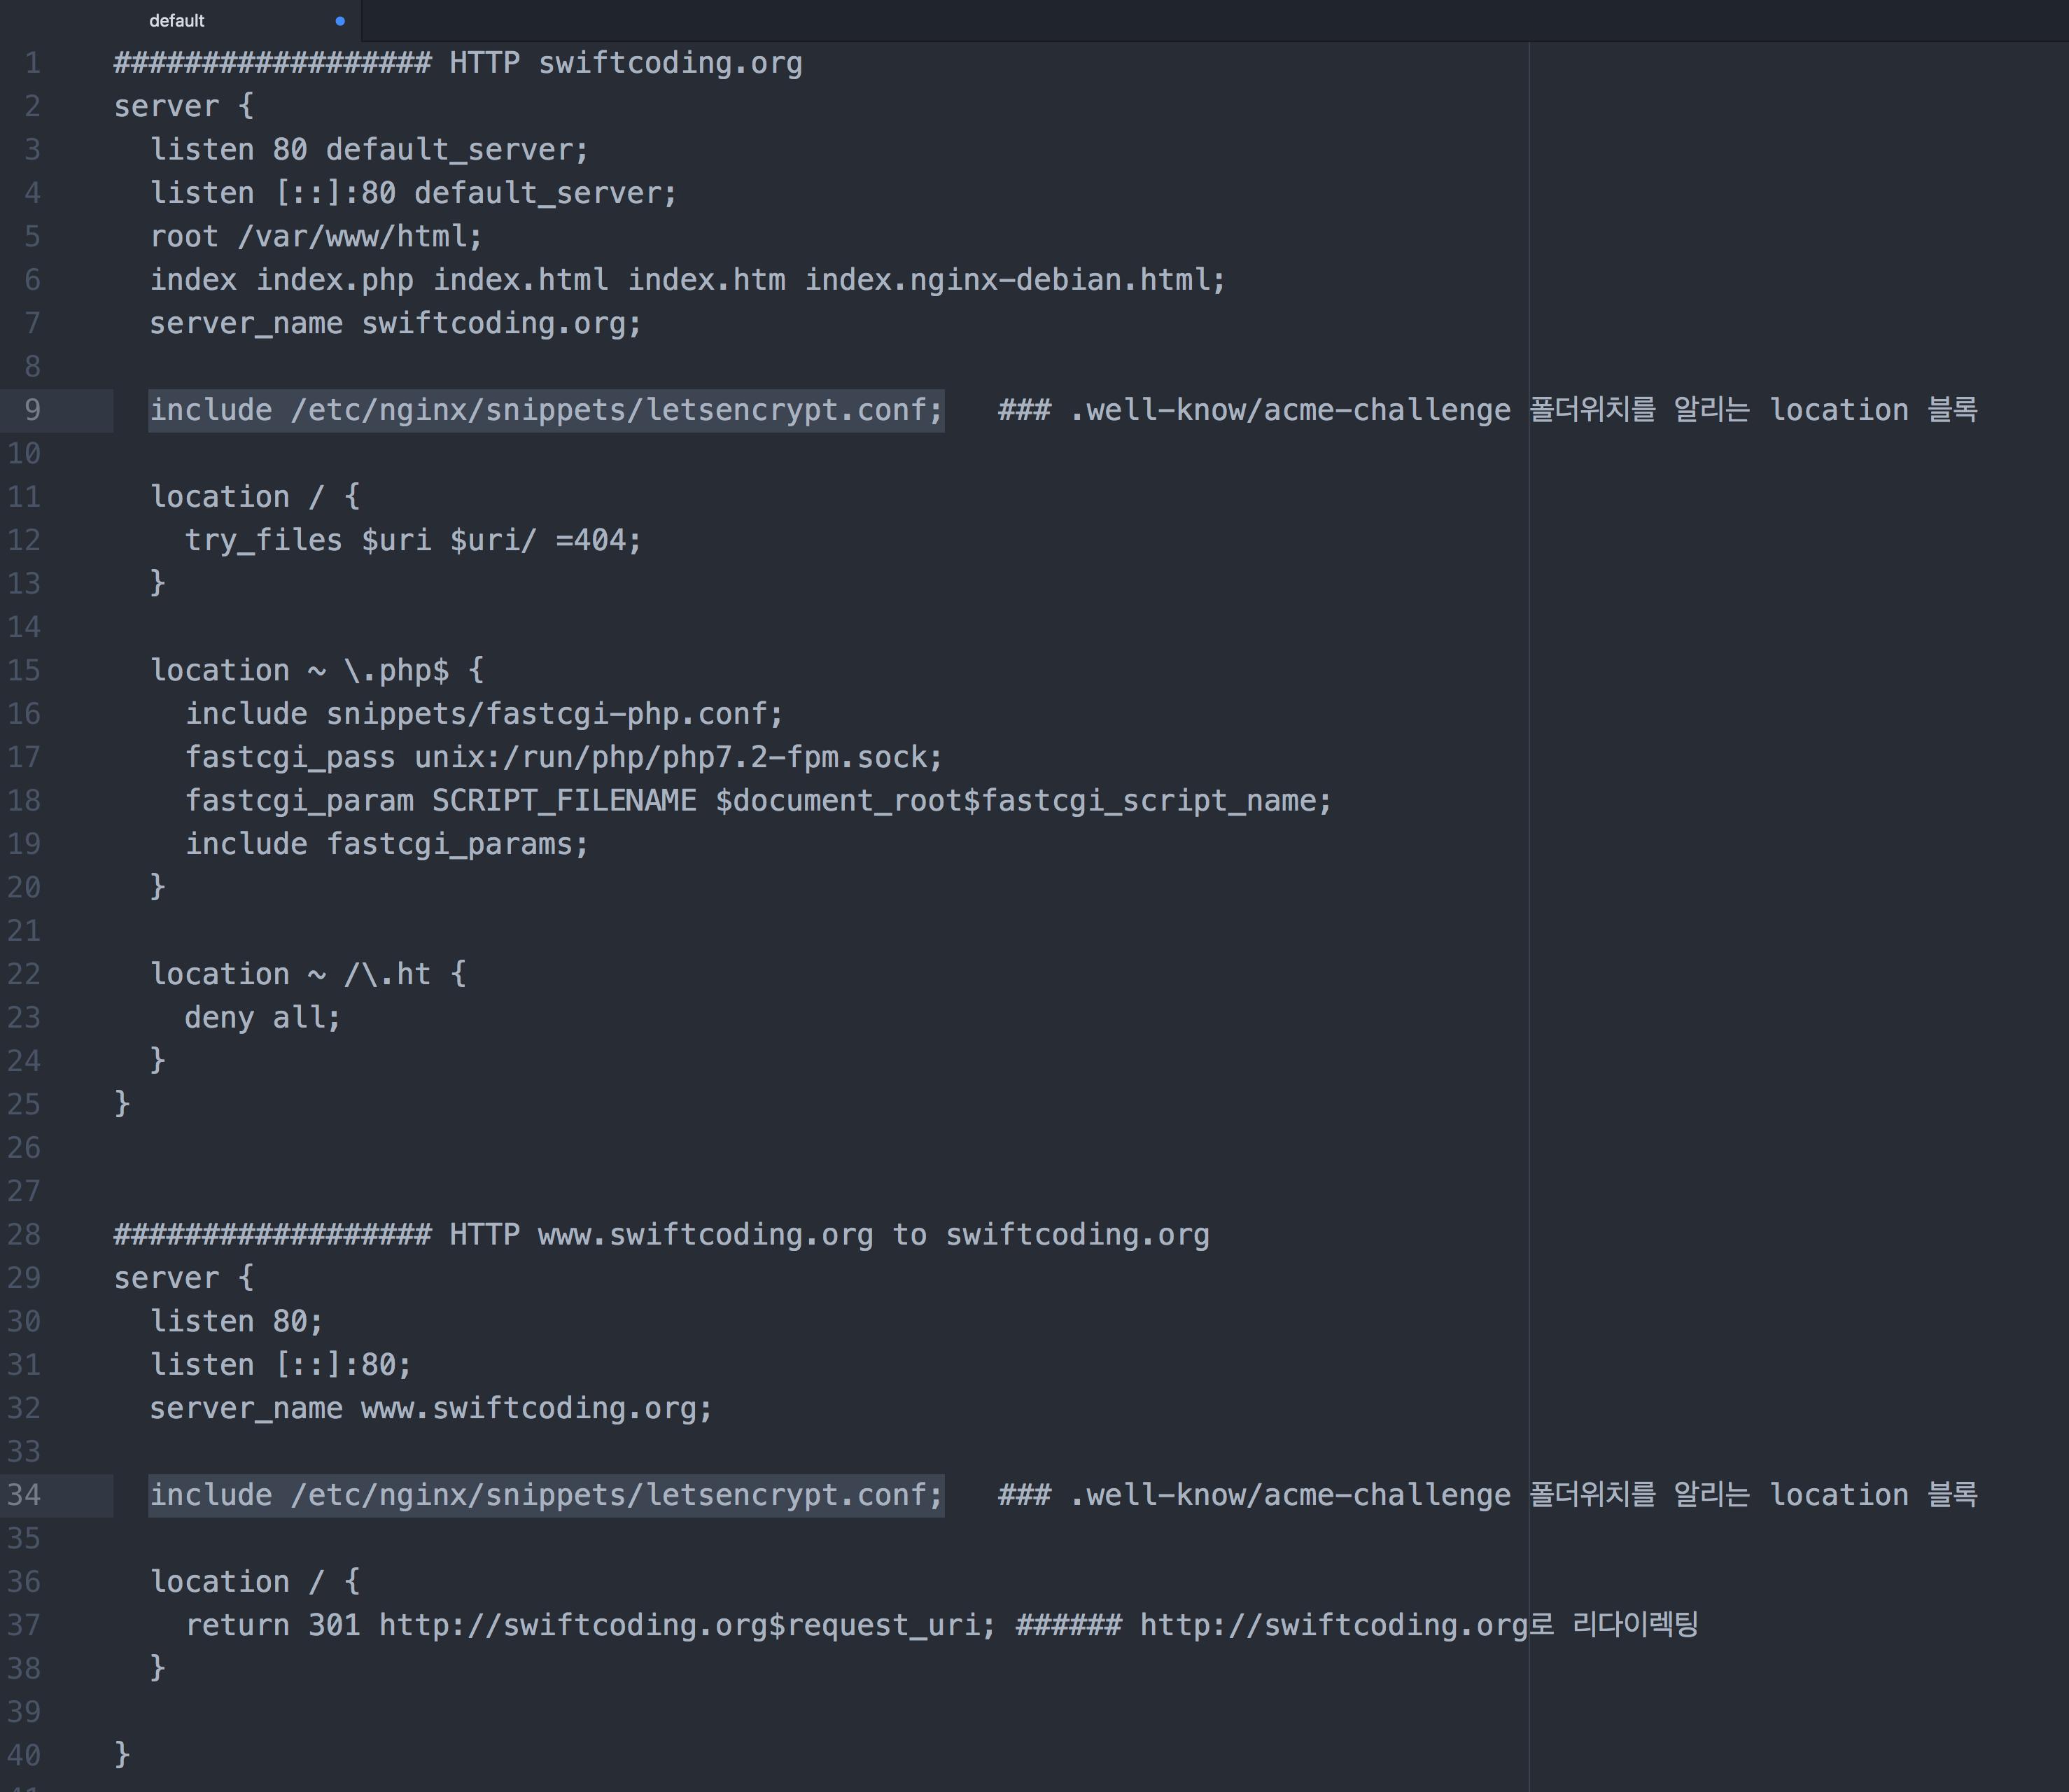 nginx 의 라우팅설정 default 파일의 전체내용